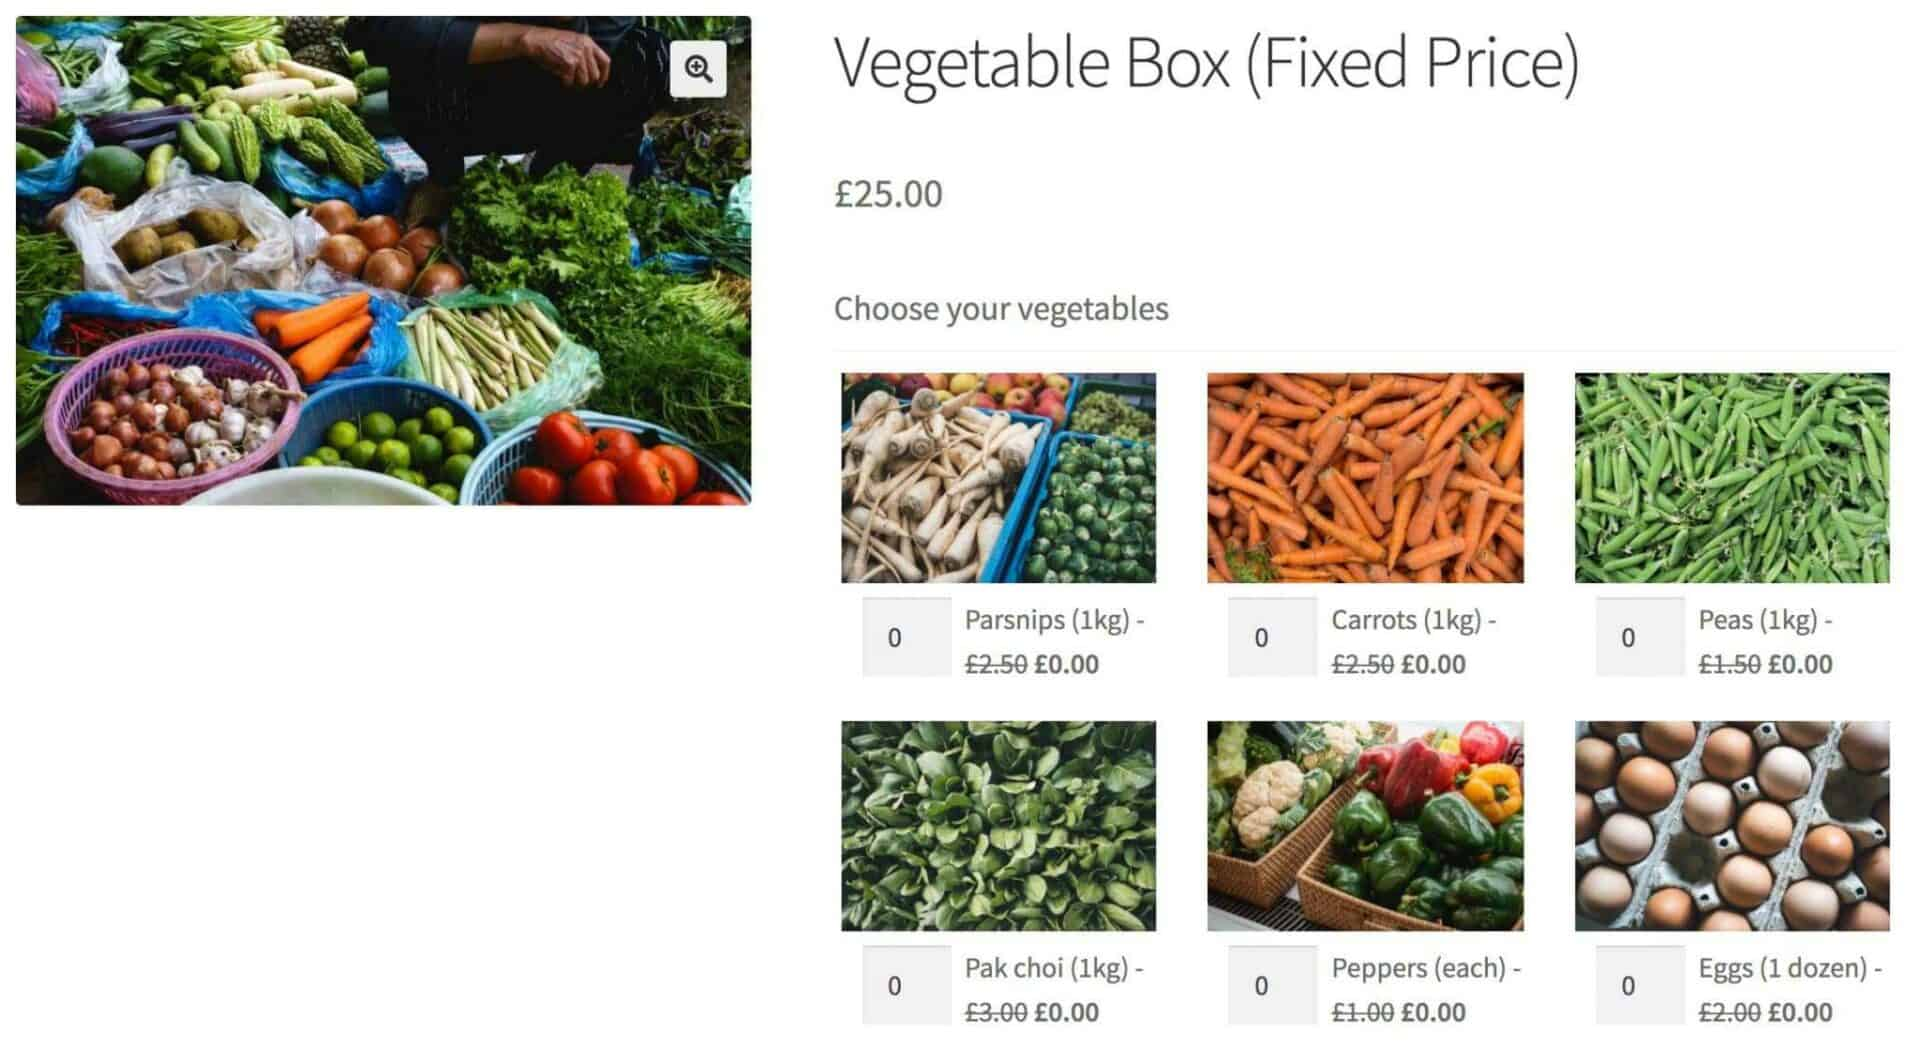 WooCommerce fixed price vegetable box